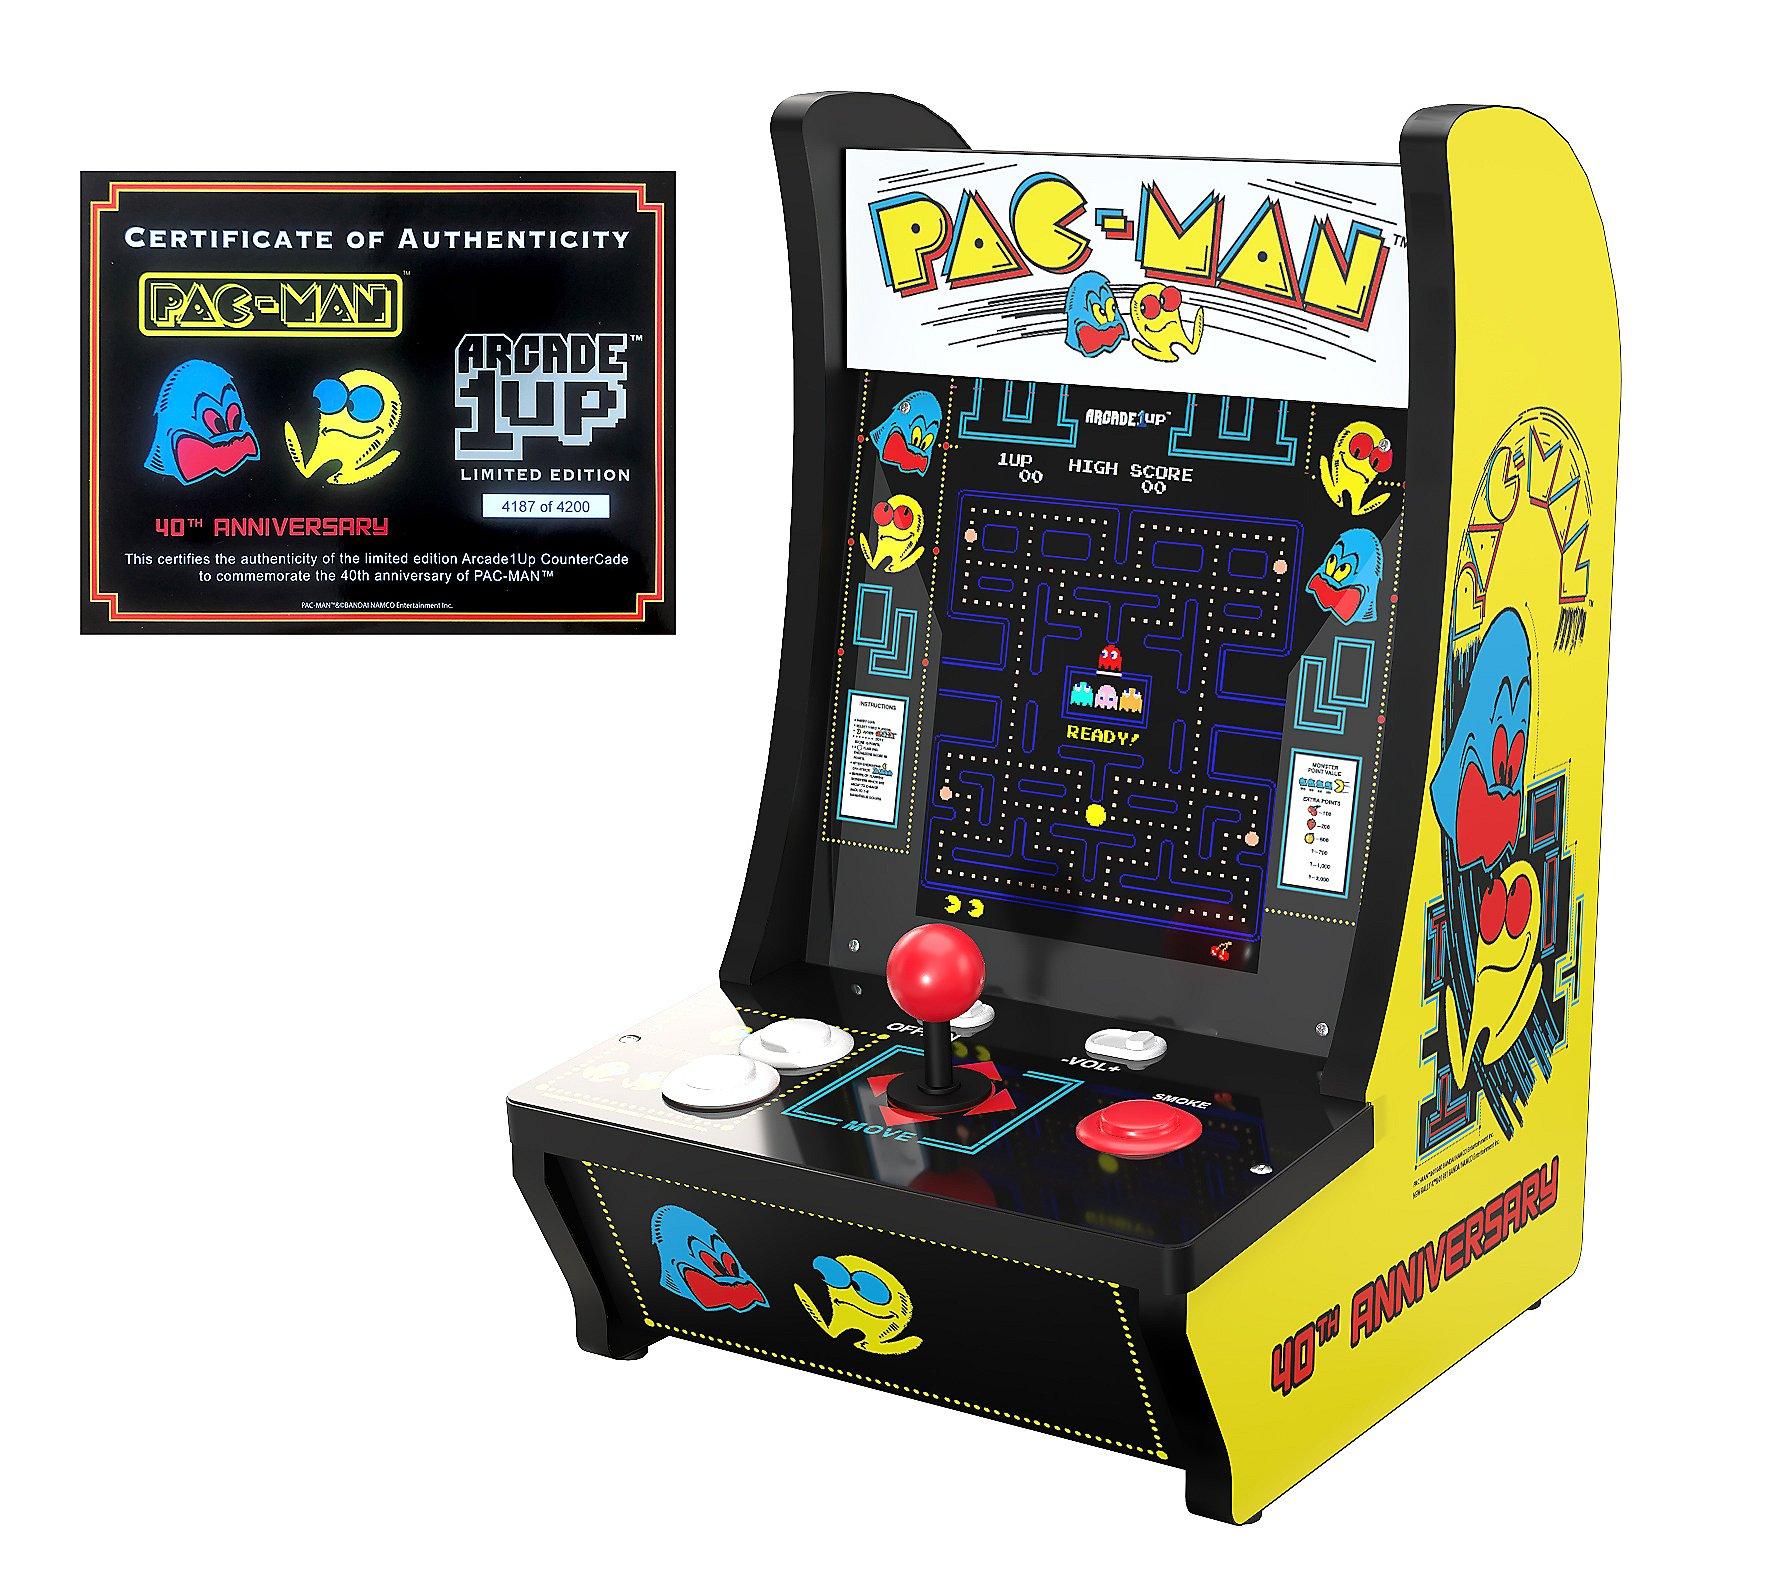 Arcade1Up 2 Game Countercade Special Edition Arcade Machine